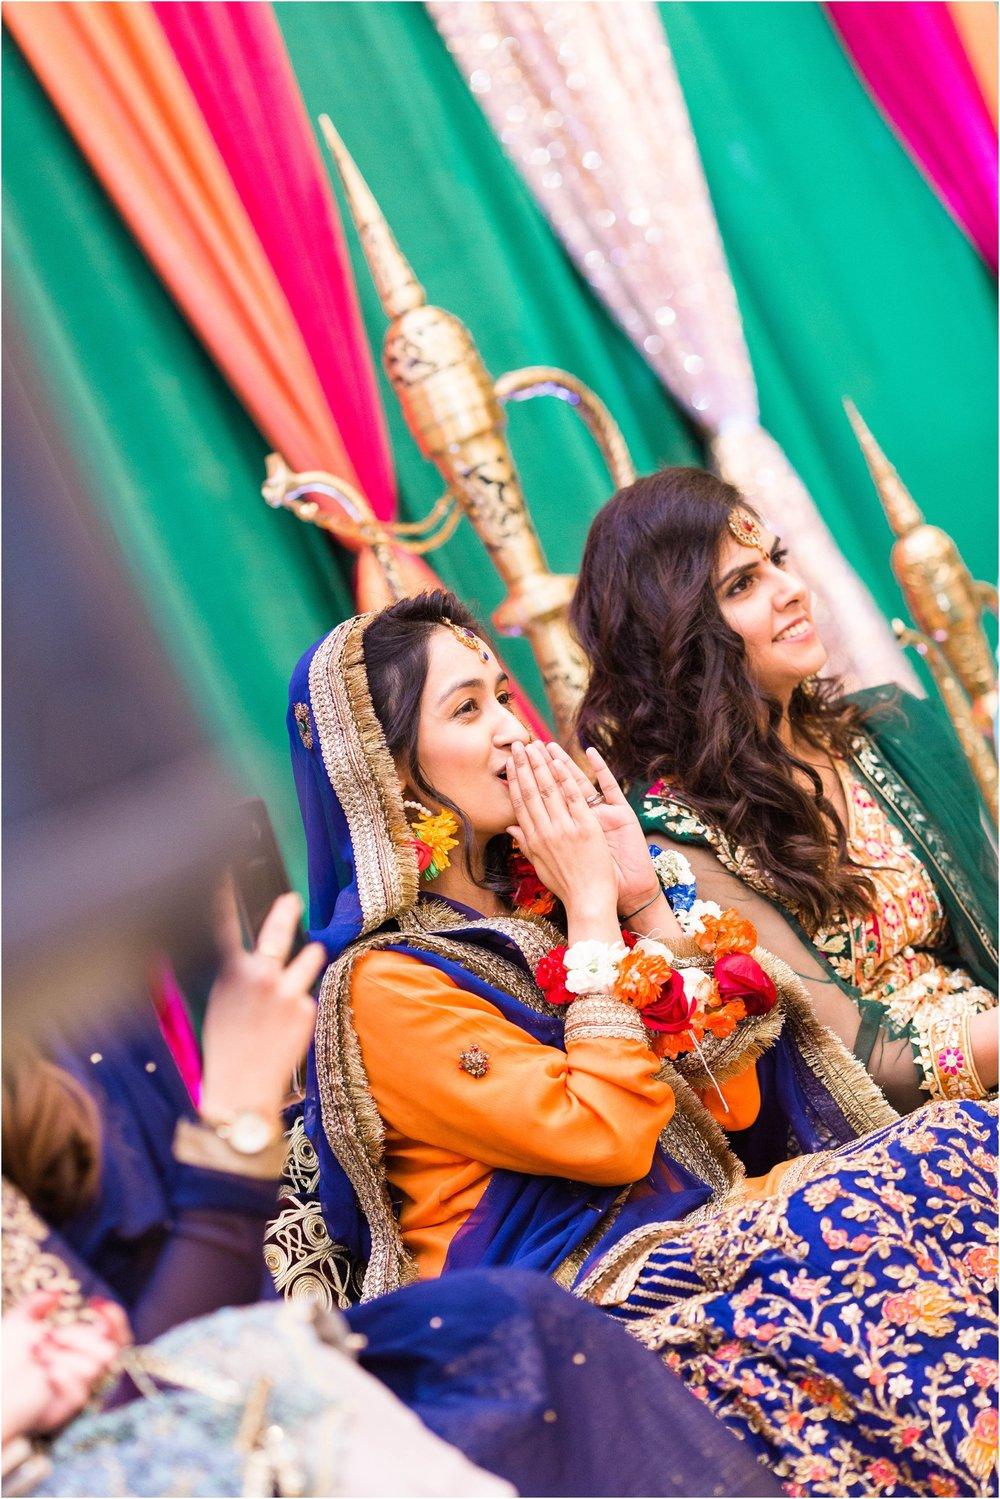 Mehndi-Markham-Convention-Centre-Toronto-Mississauga-Brampton-Scarborough-GTA-Pakistani-Indian-Wedding-Engagement-Photographer-Photography_0022.jpg